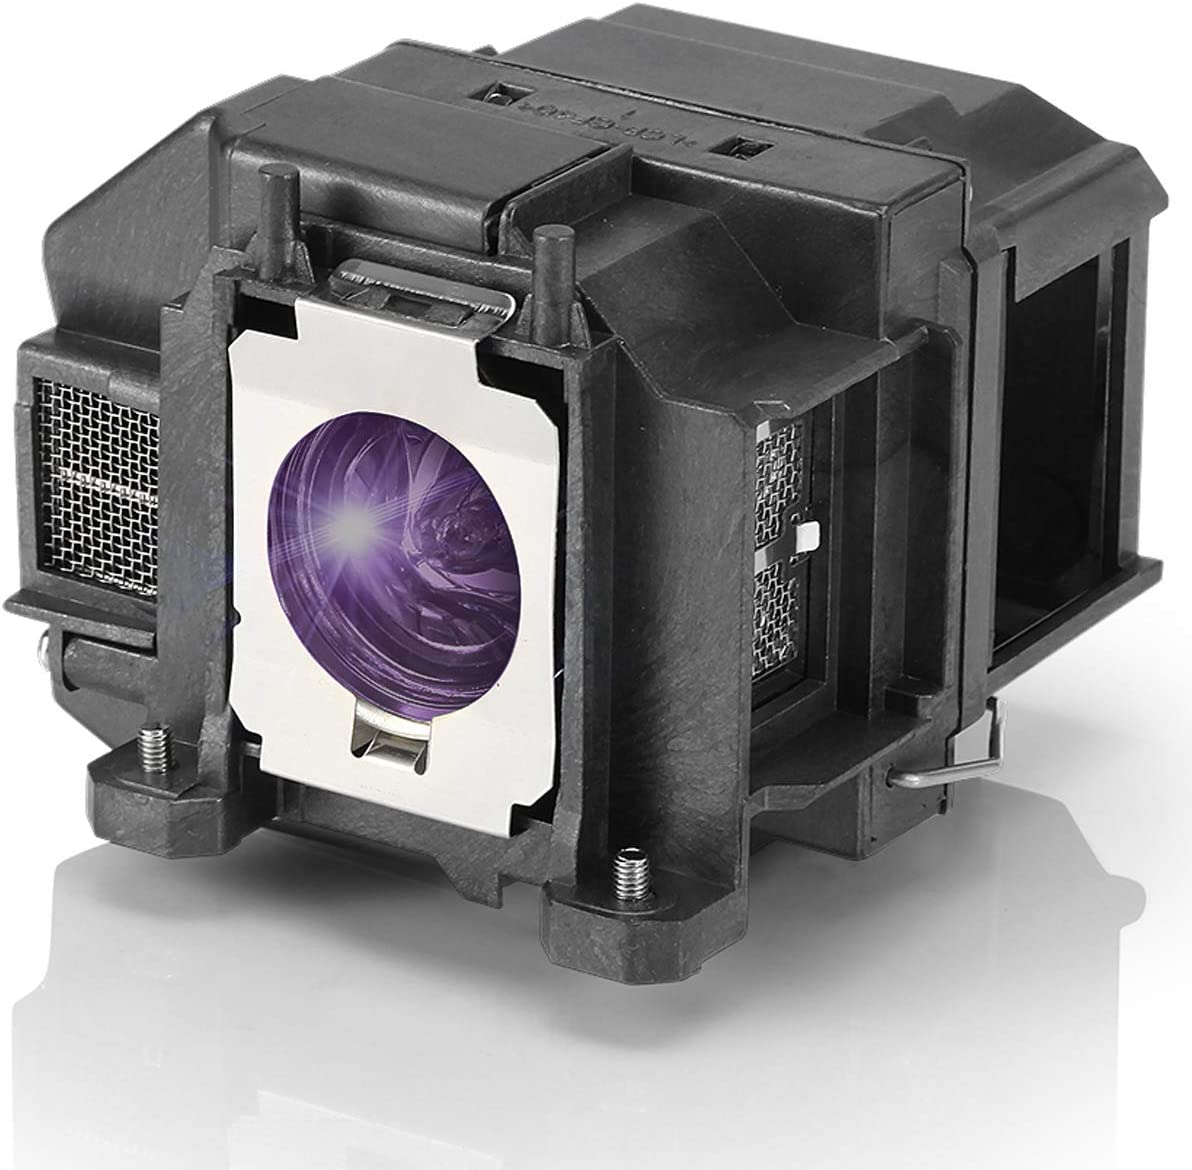 ESolid Elplp67 Relplacemnet Projector Lamp Bulb for Epson EX3210 EX3212 EX5210 EX6210 EX7210 PowerLite Home Cinema 500 750d 707 710HD 750HD VS220 S12 W12 TW550 H428A VS210 V13h010l67 Projector Bulb